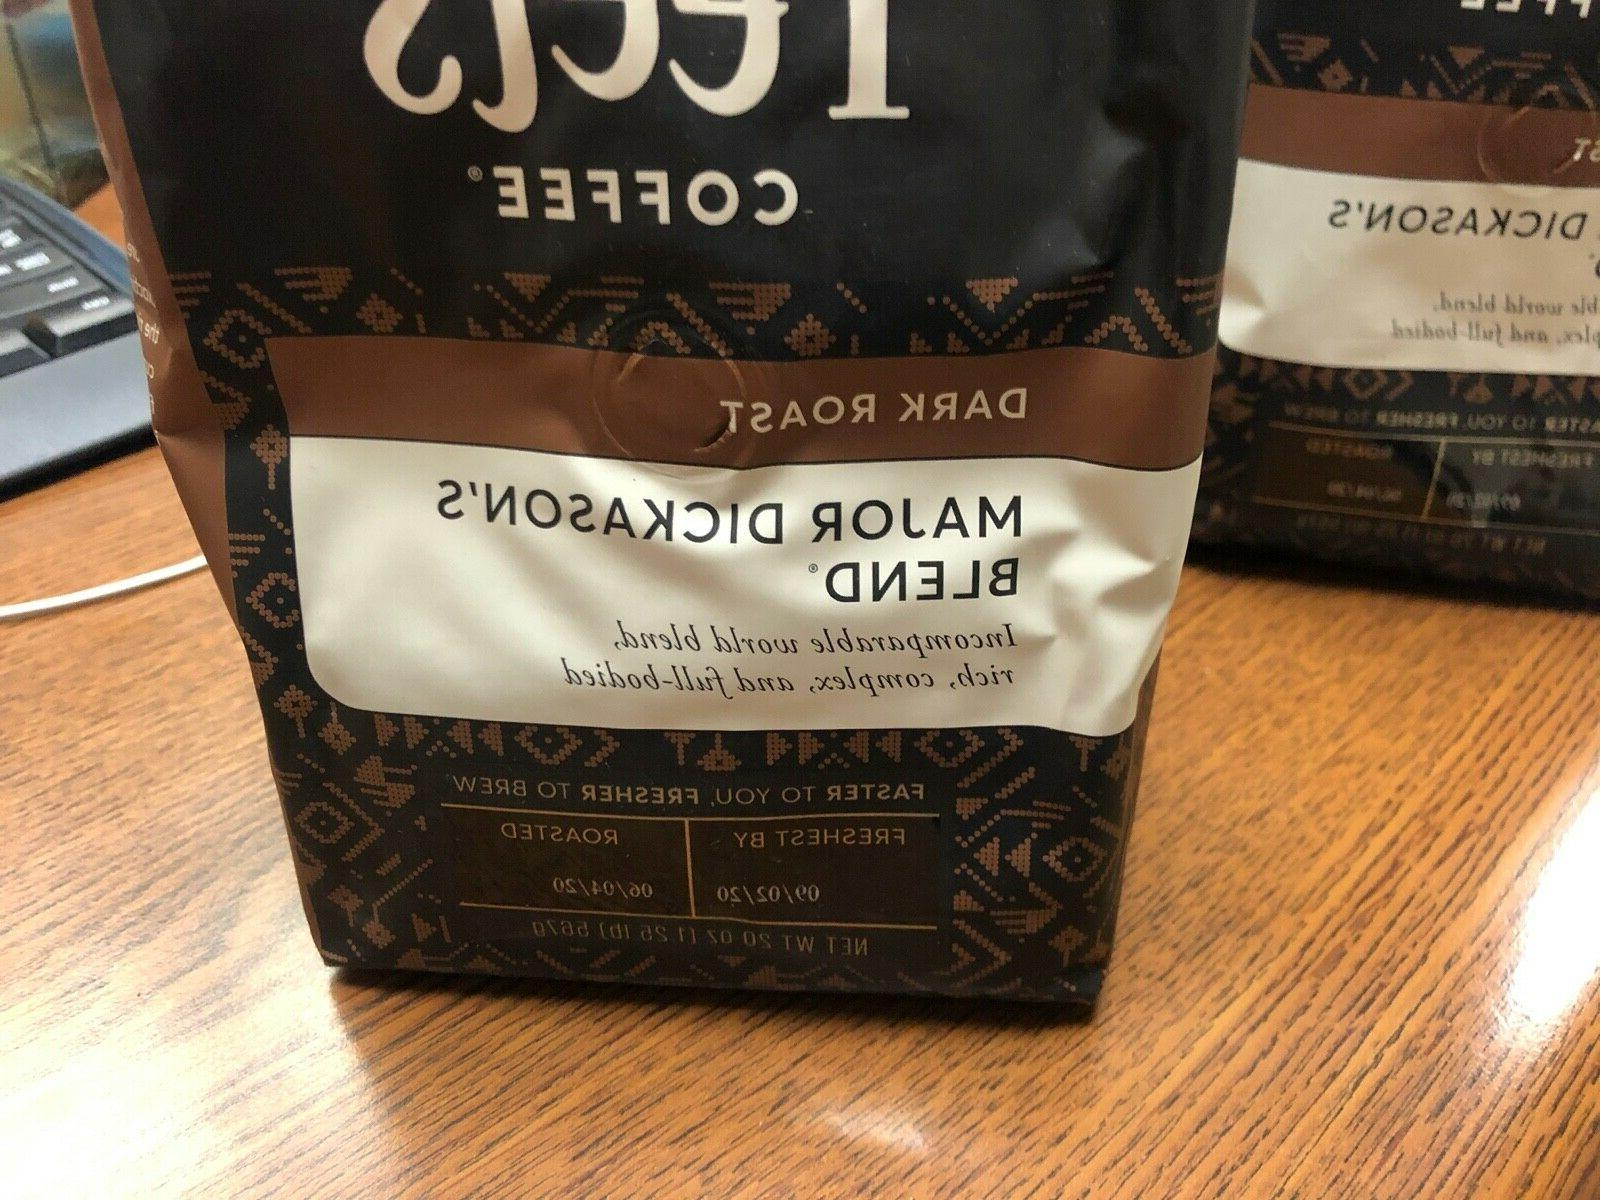 Peets Coffee Major Blend Pre 20 oz Lot 2 BB 9/2/2020